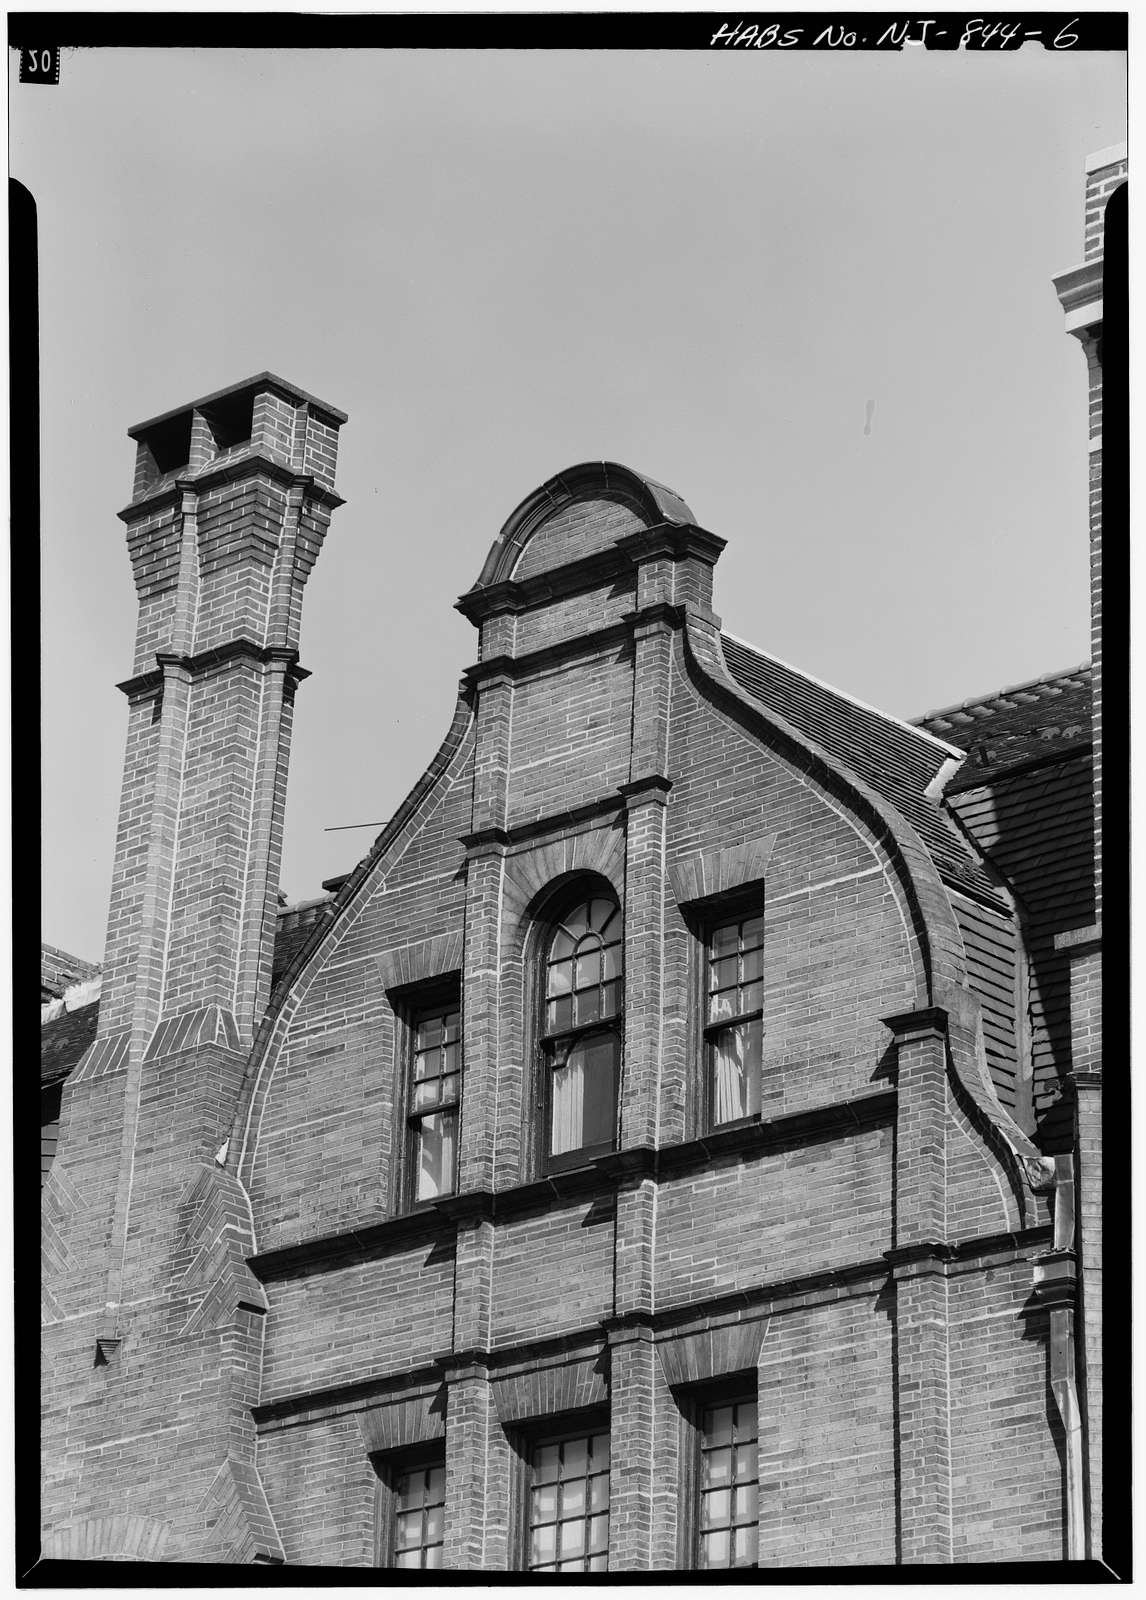 Dr. H. Genet Taylor House & Offices, 305 Cooper Street, Camden, Camden County, NJ